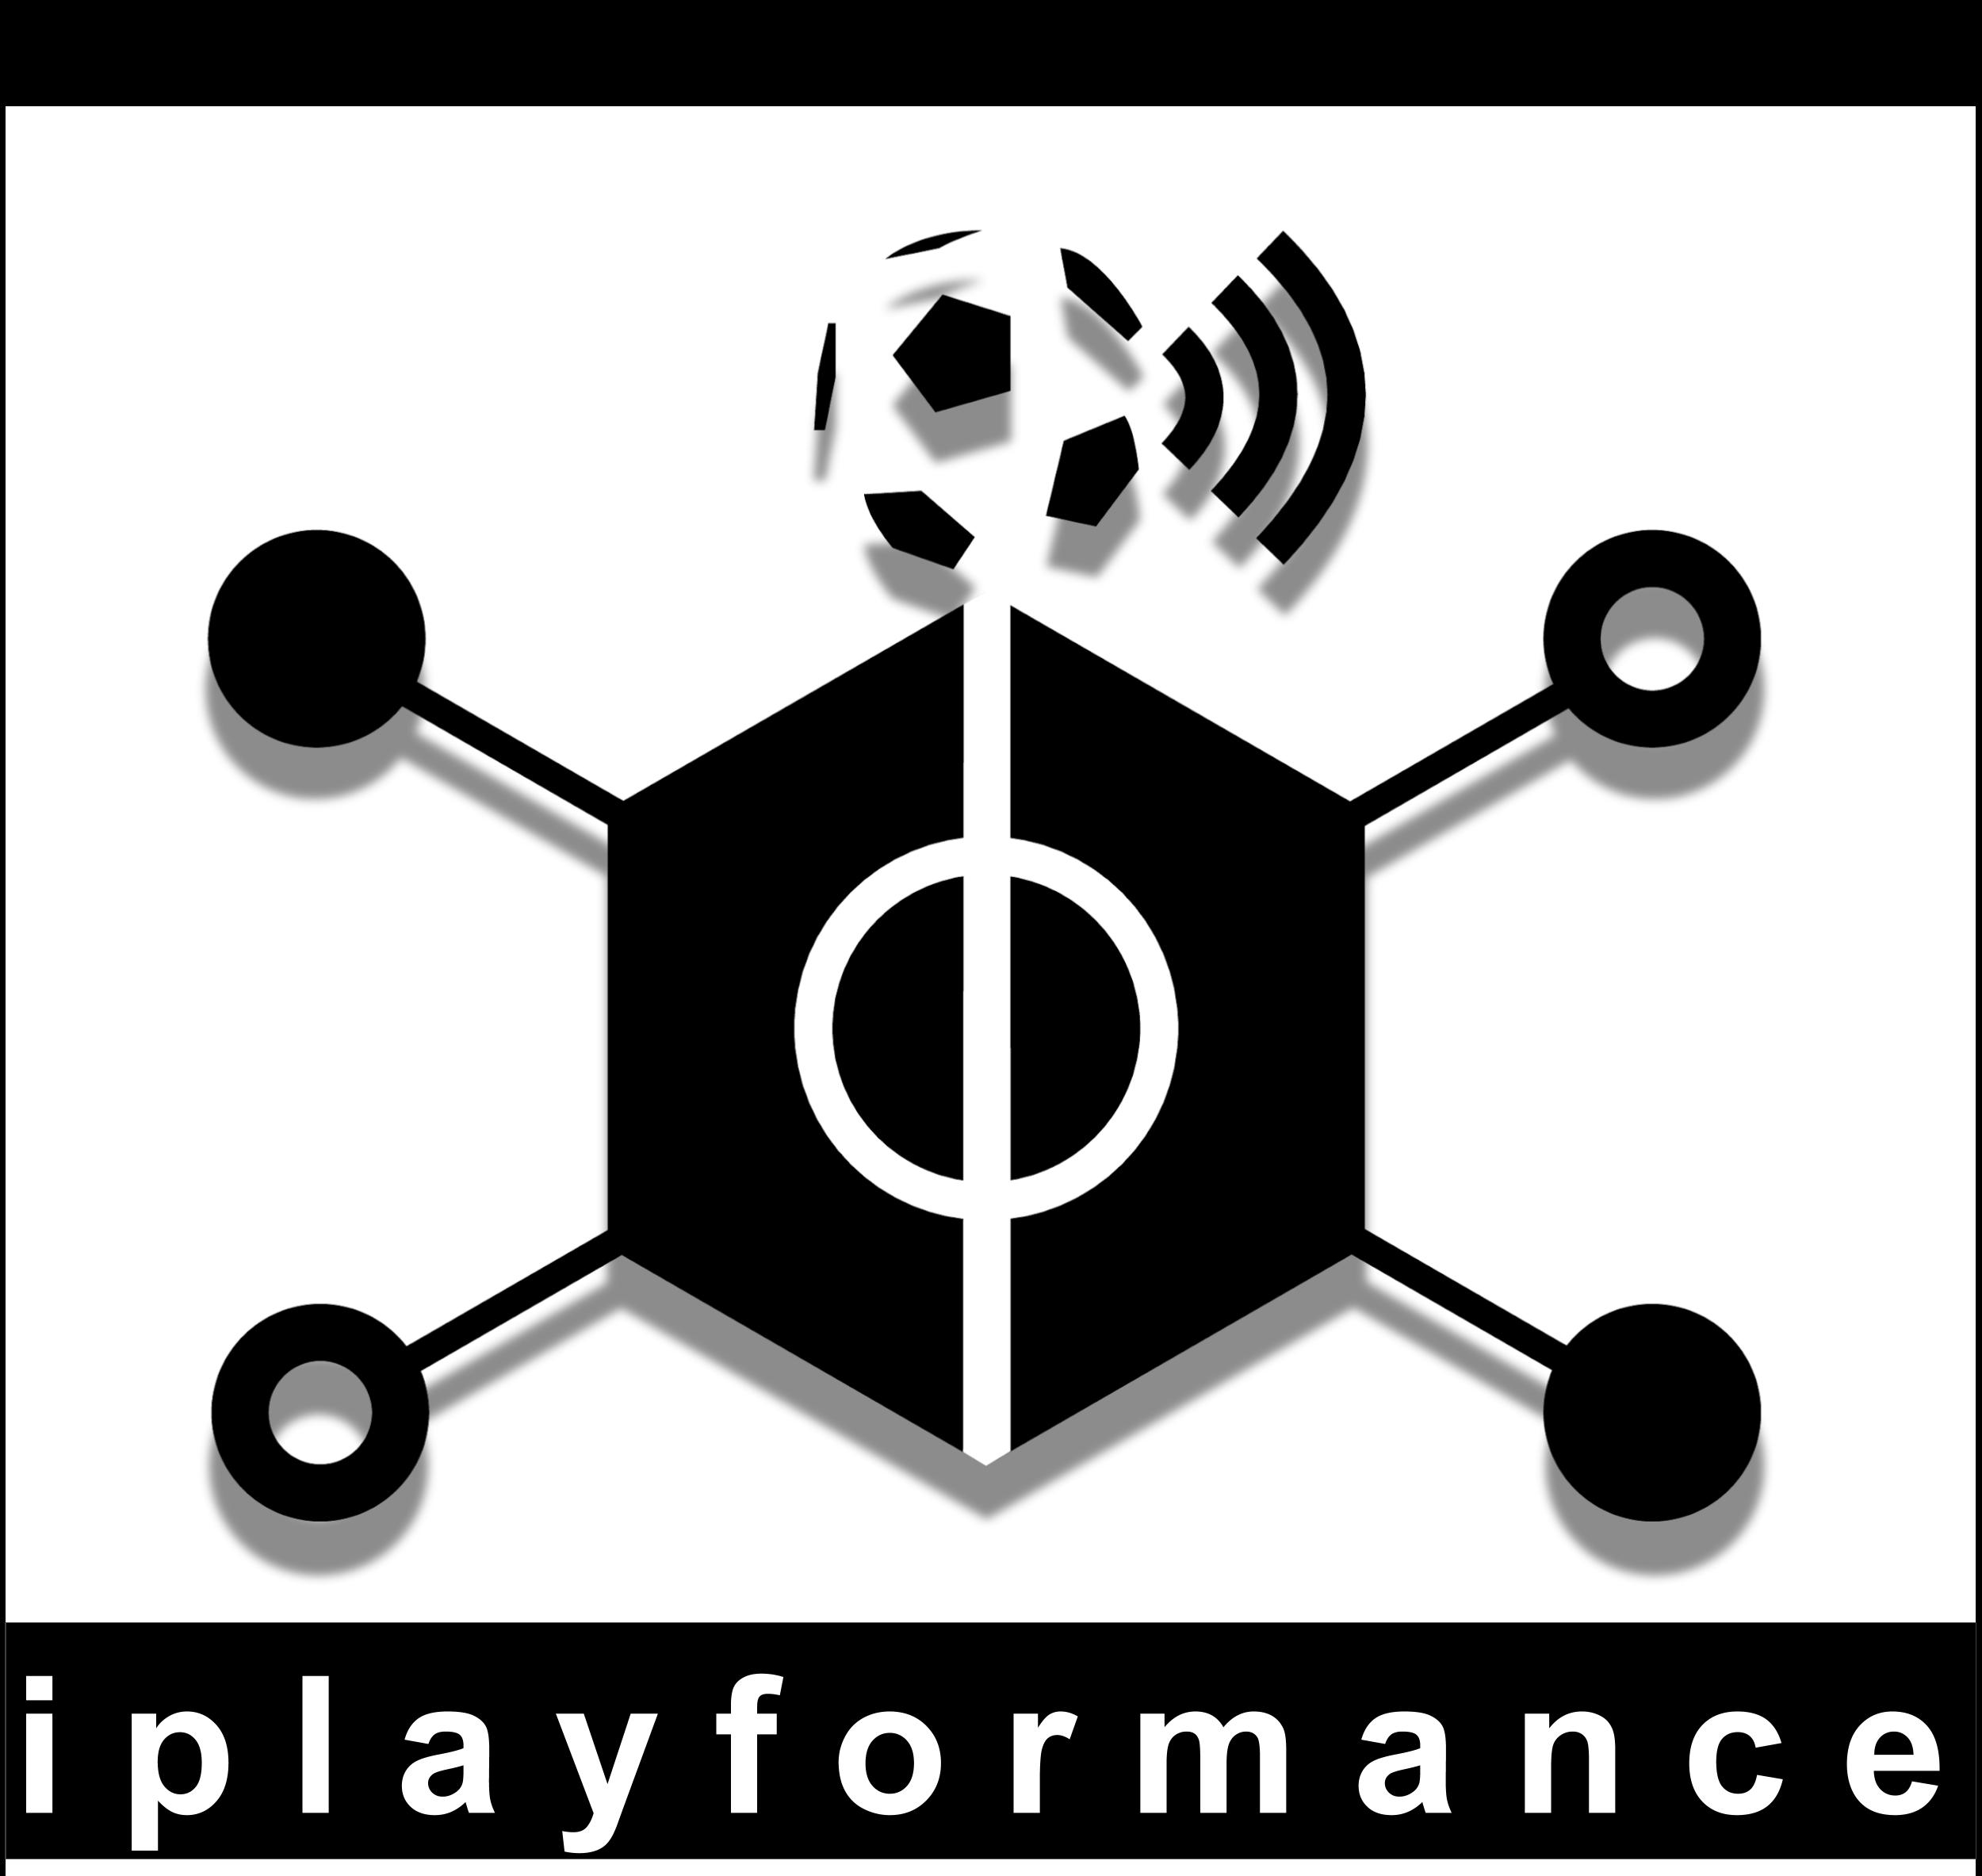 iplayformance.com